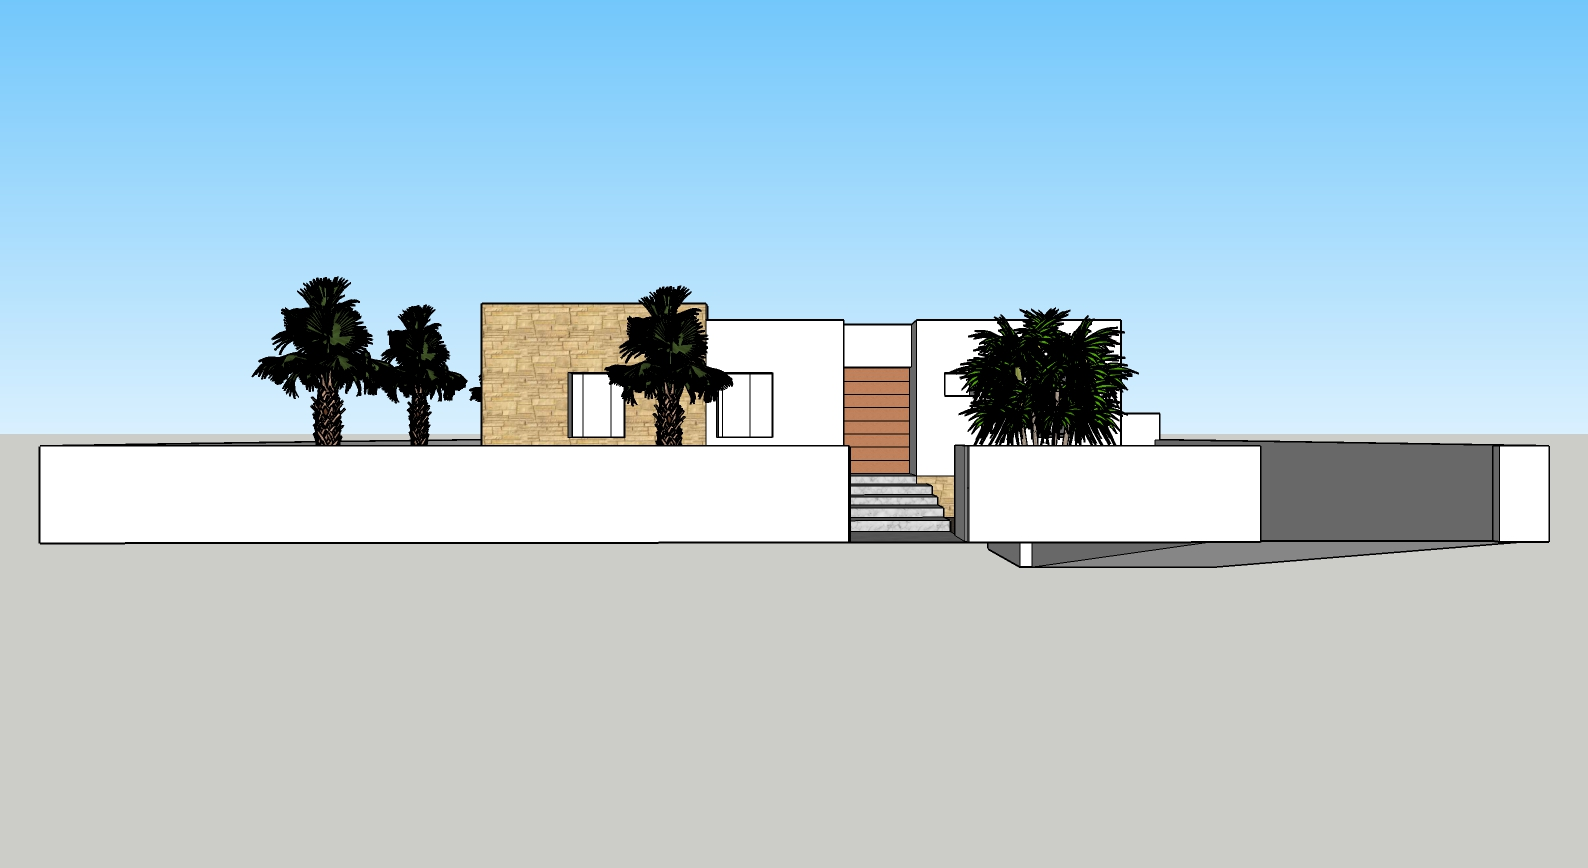 Nieuwbouwproject Caporchanes Vera-Playa Spanje Almeria